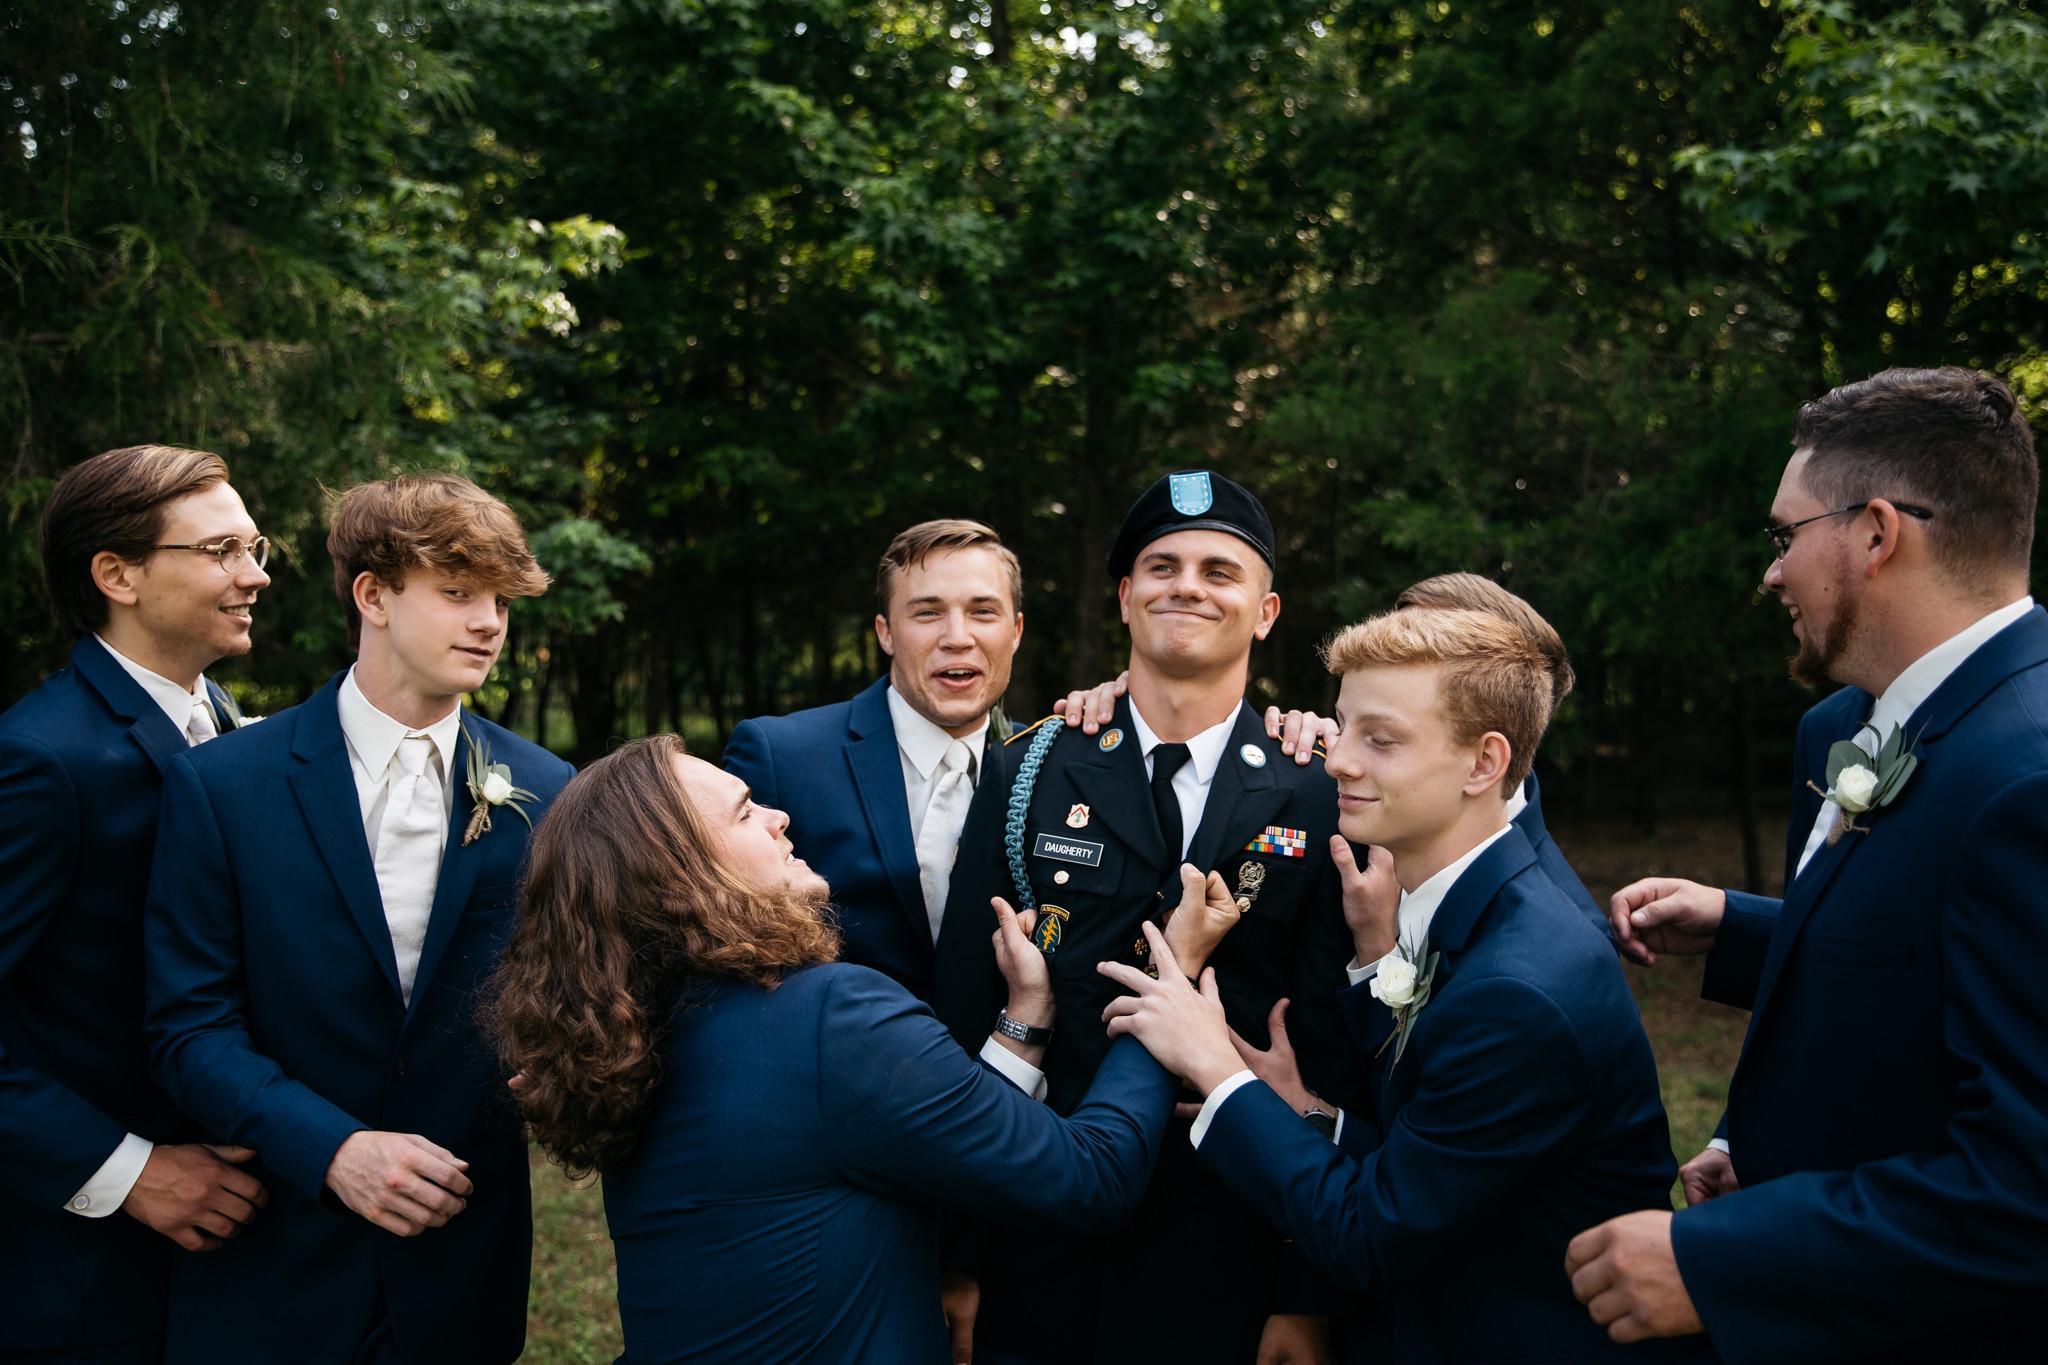 backyard-wedding-thewarmtharoundyou-lexy-branson-49.jpg